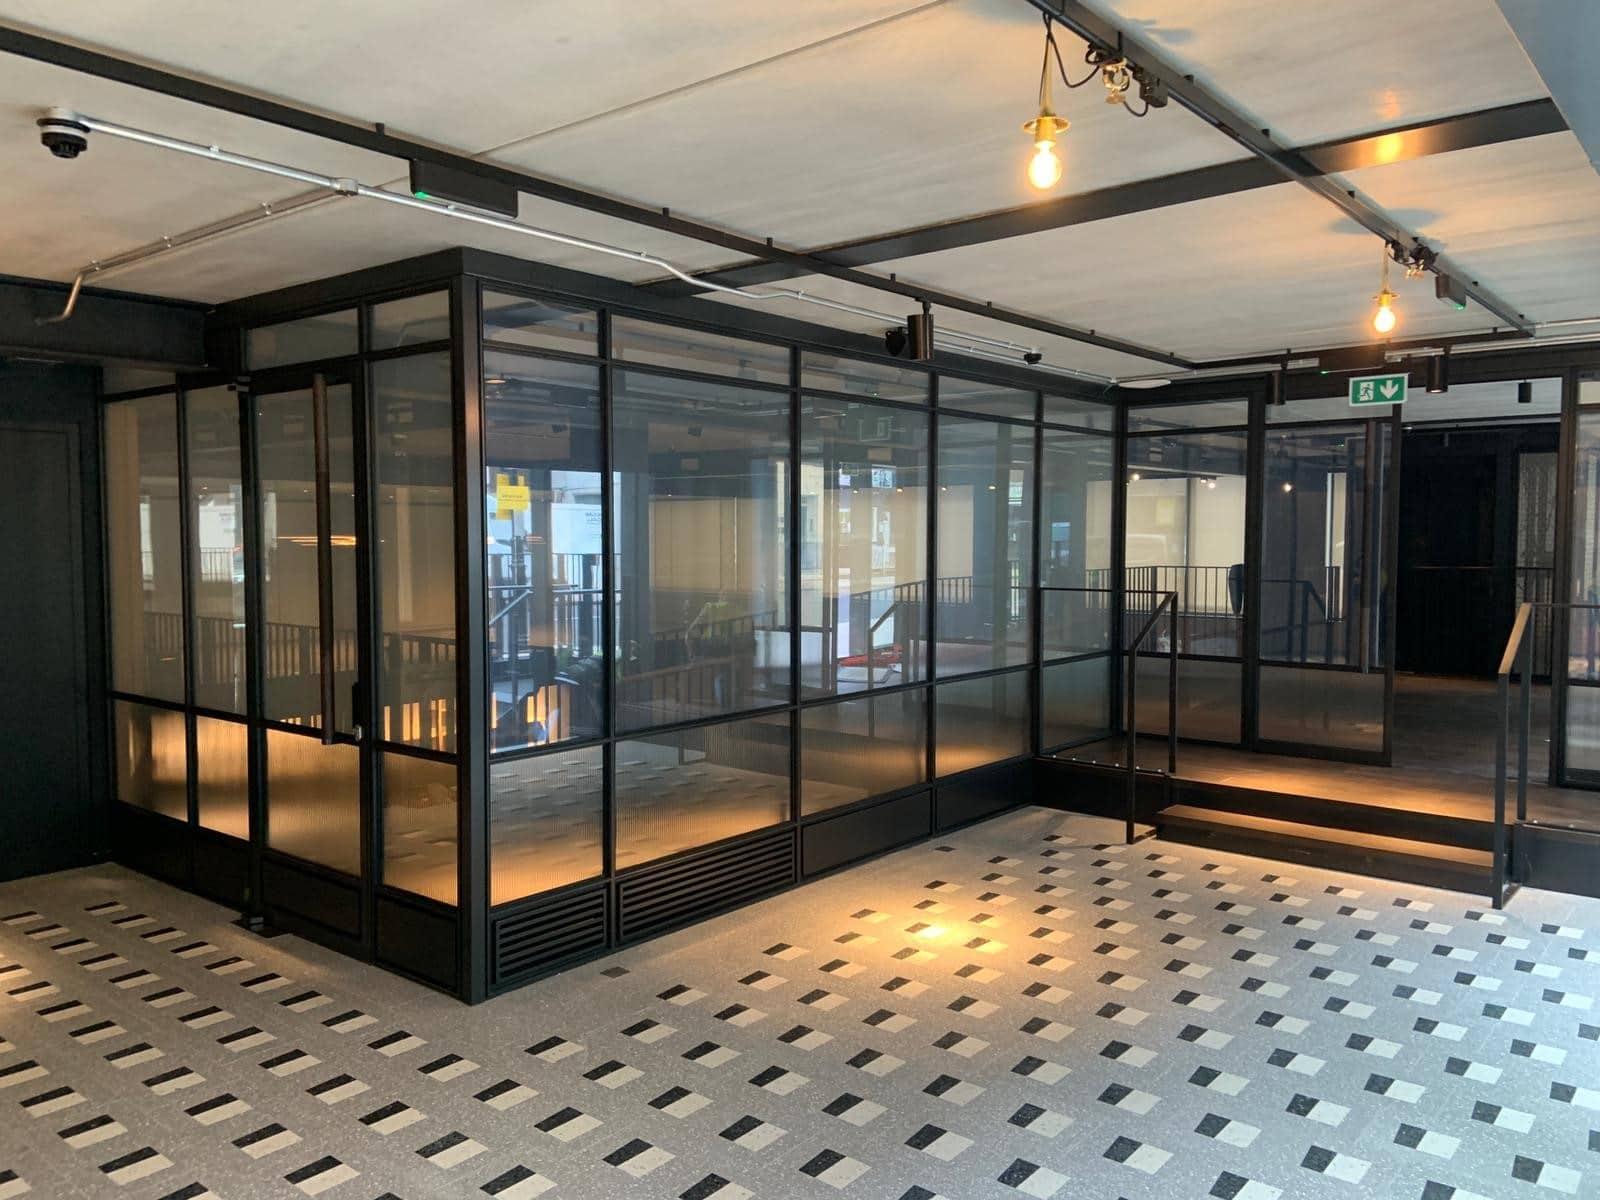 steel framed internal glazing